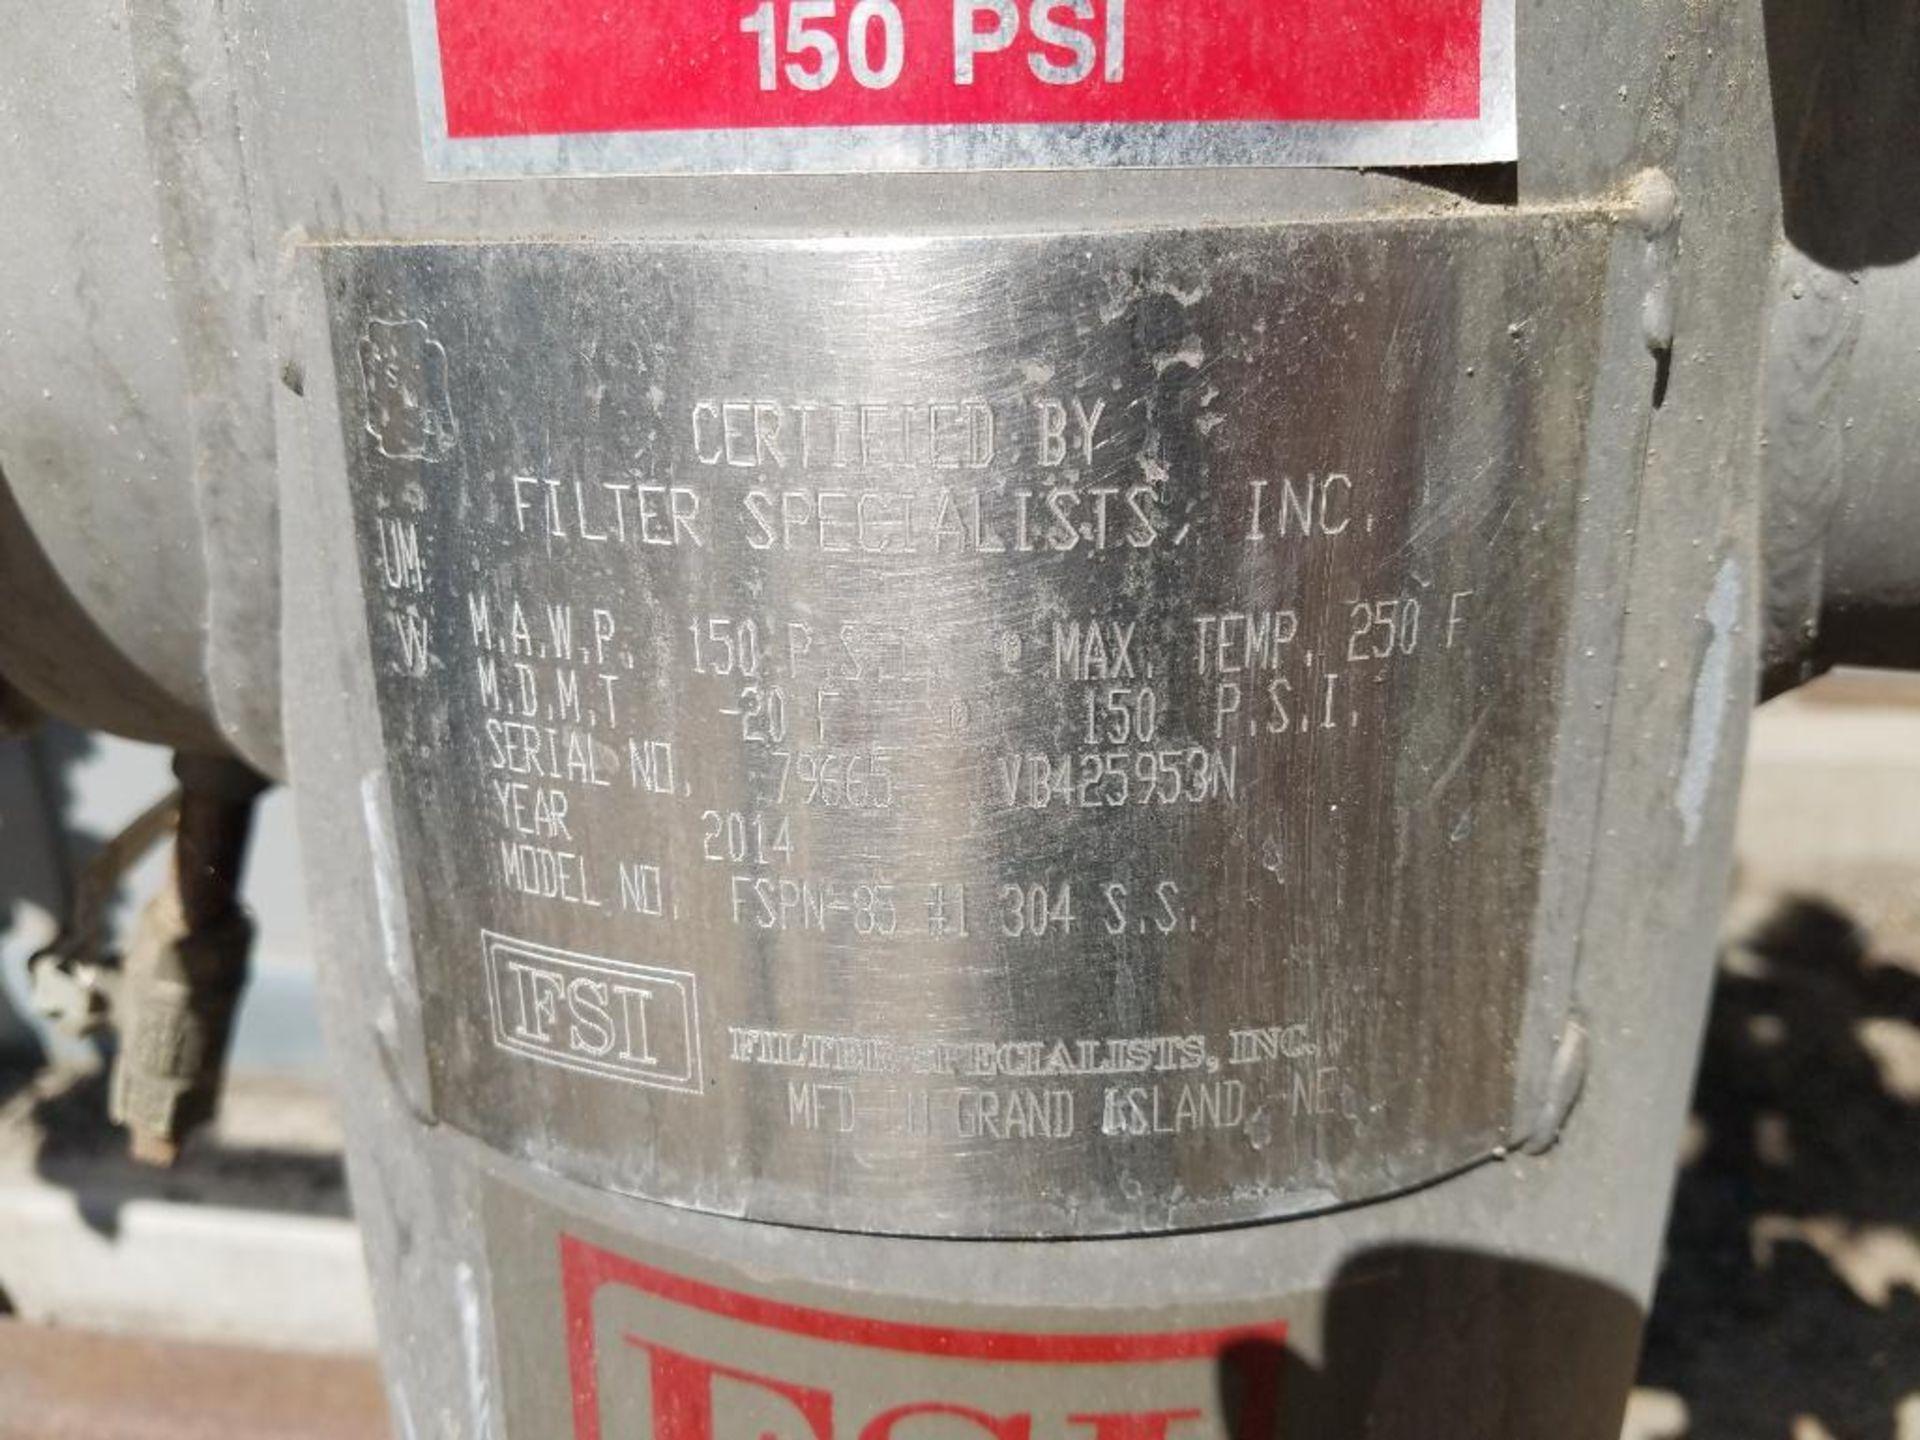 2014 FSI stainless steel vertical strainer basket - Image 3 of 3